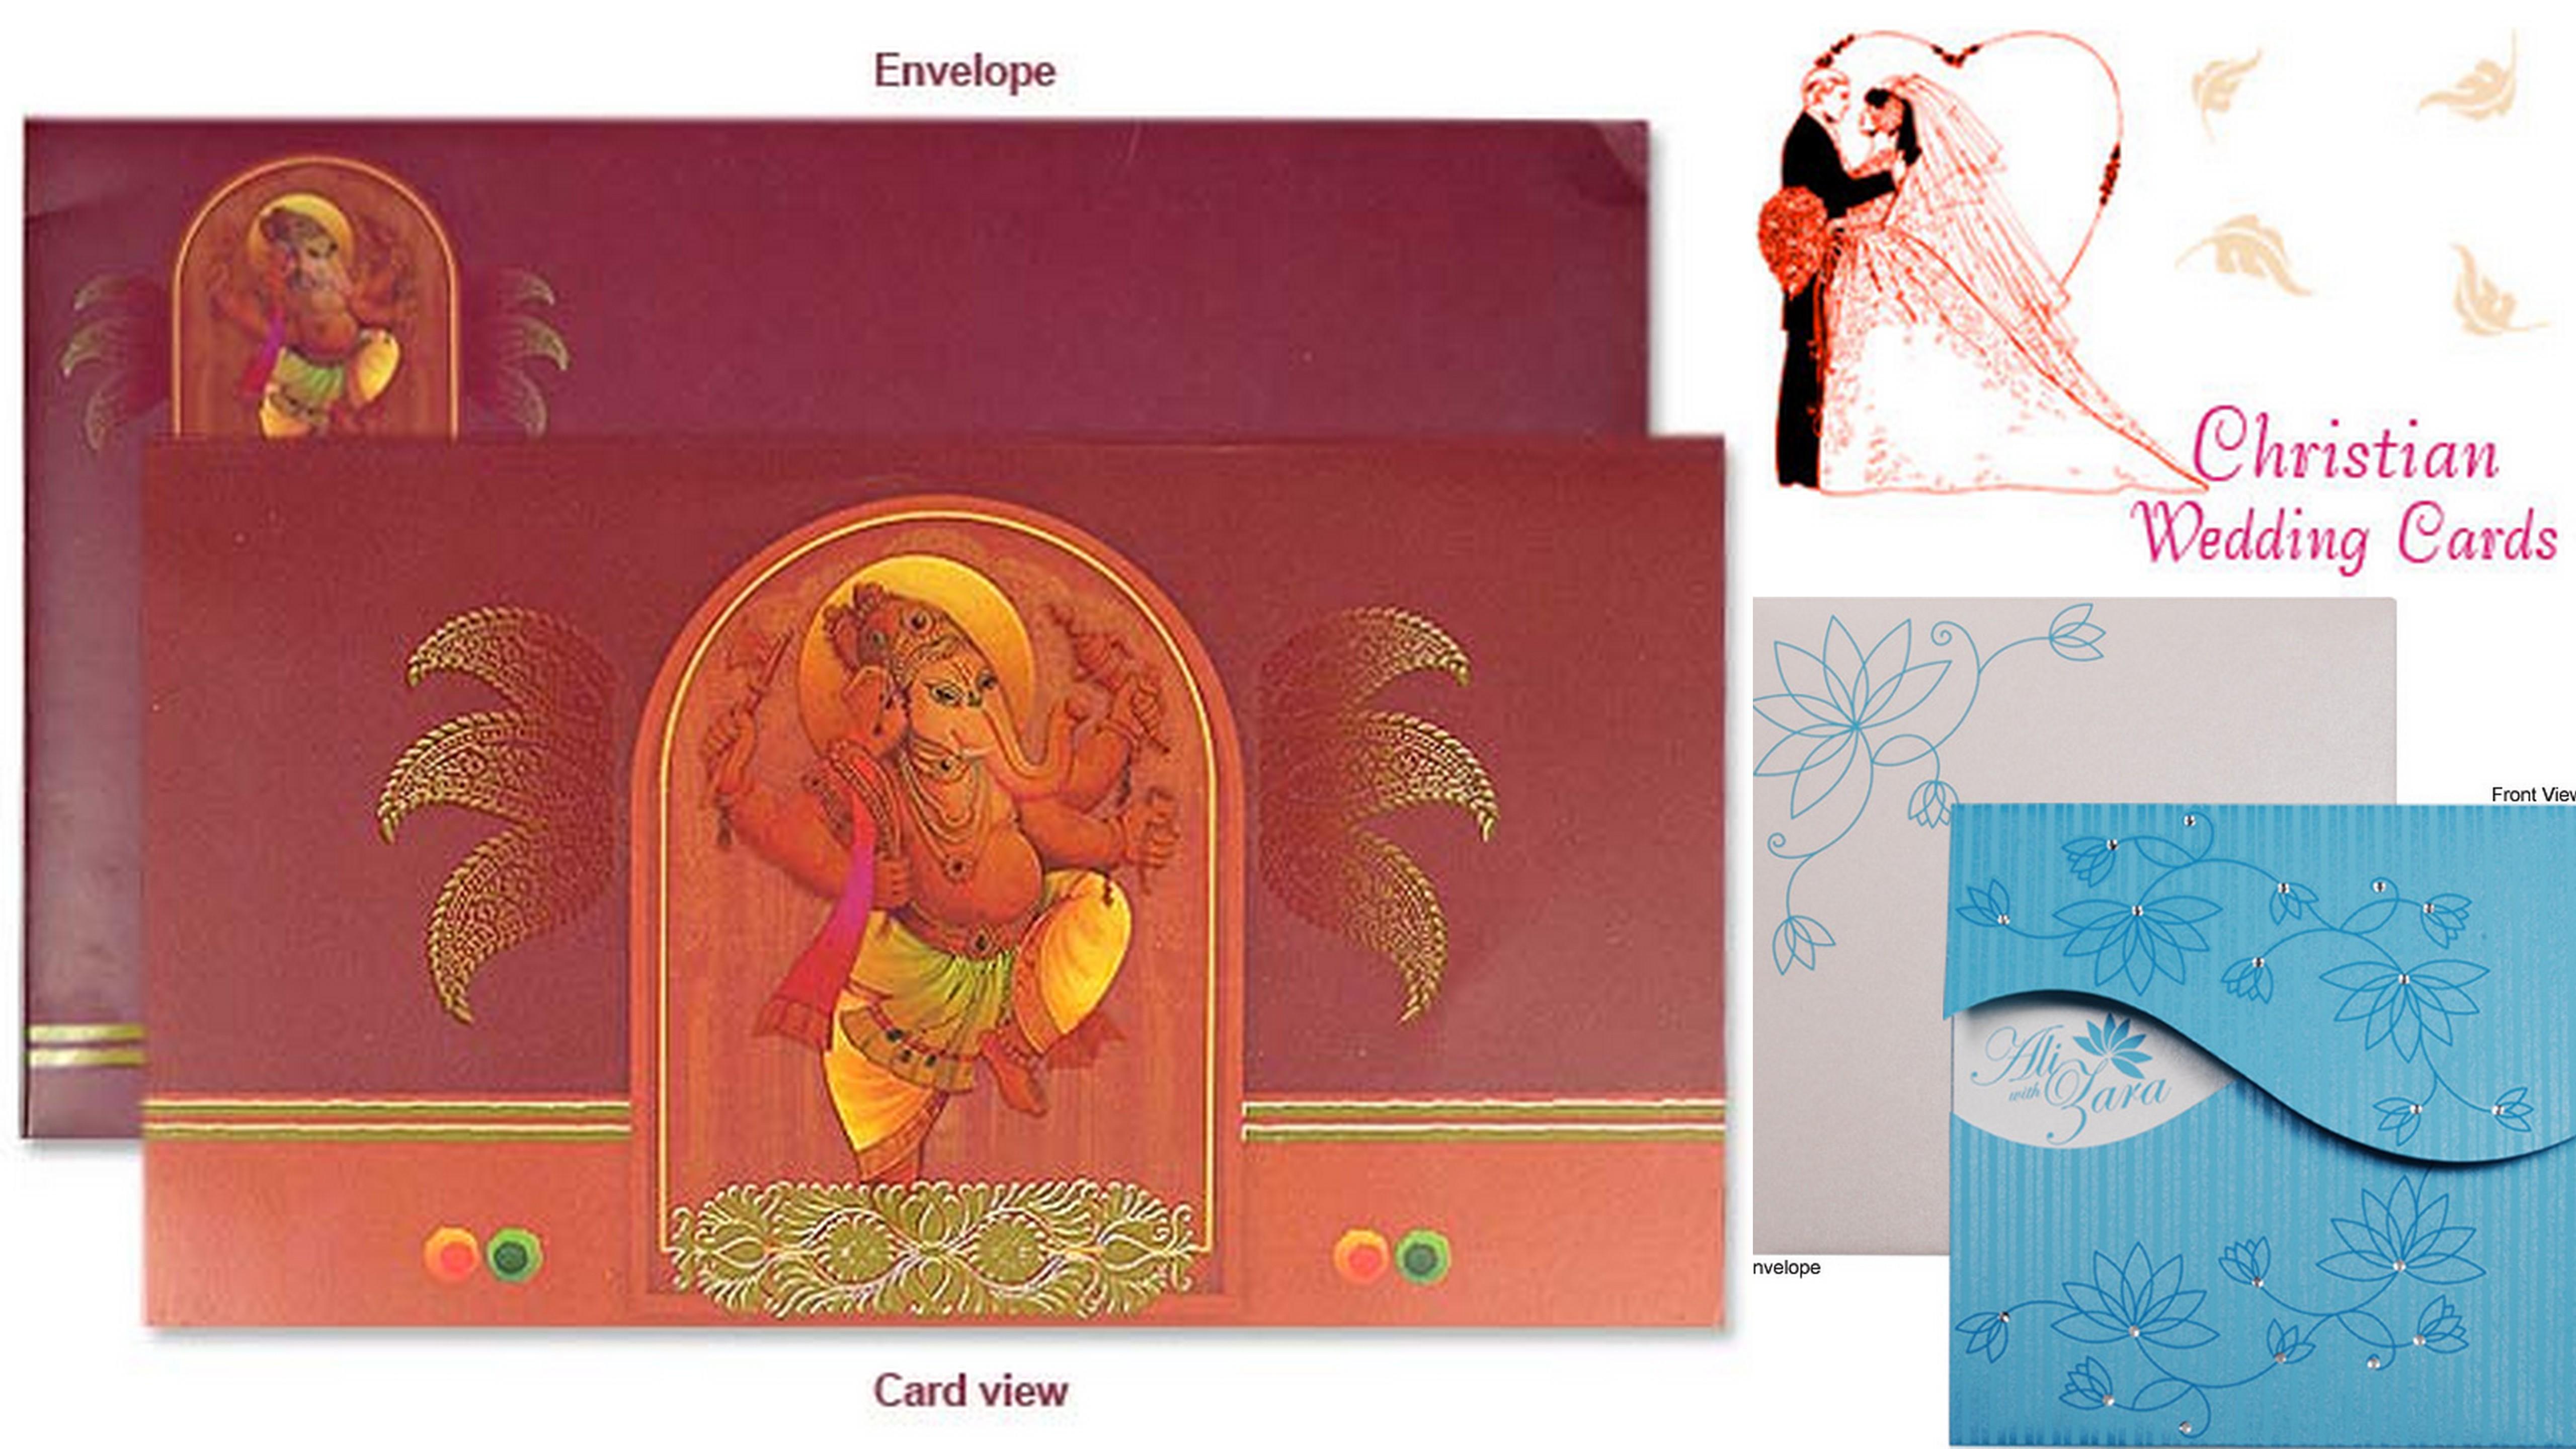 Wedding Invitation Cards Trends in 2014 | IndianWeddingCards